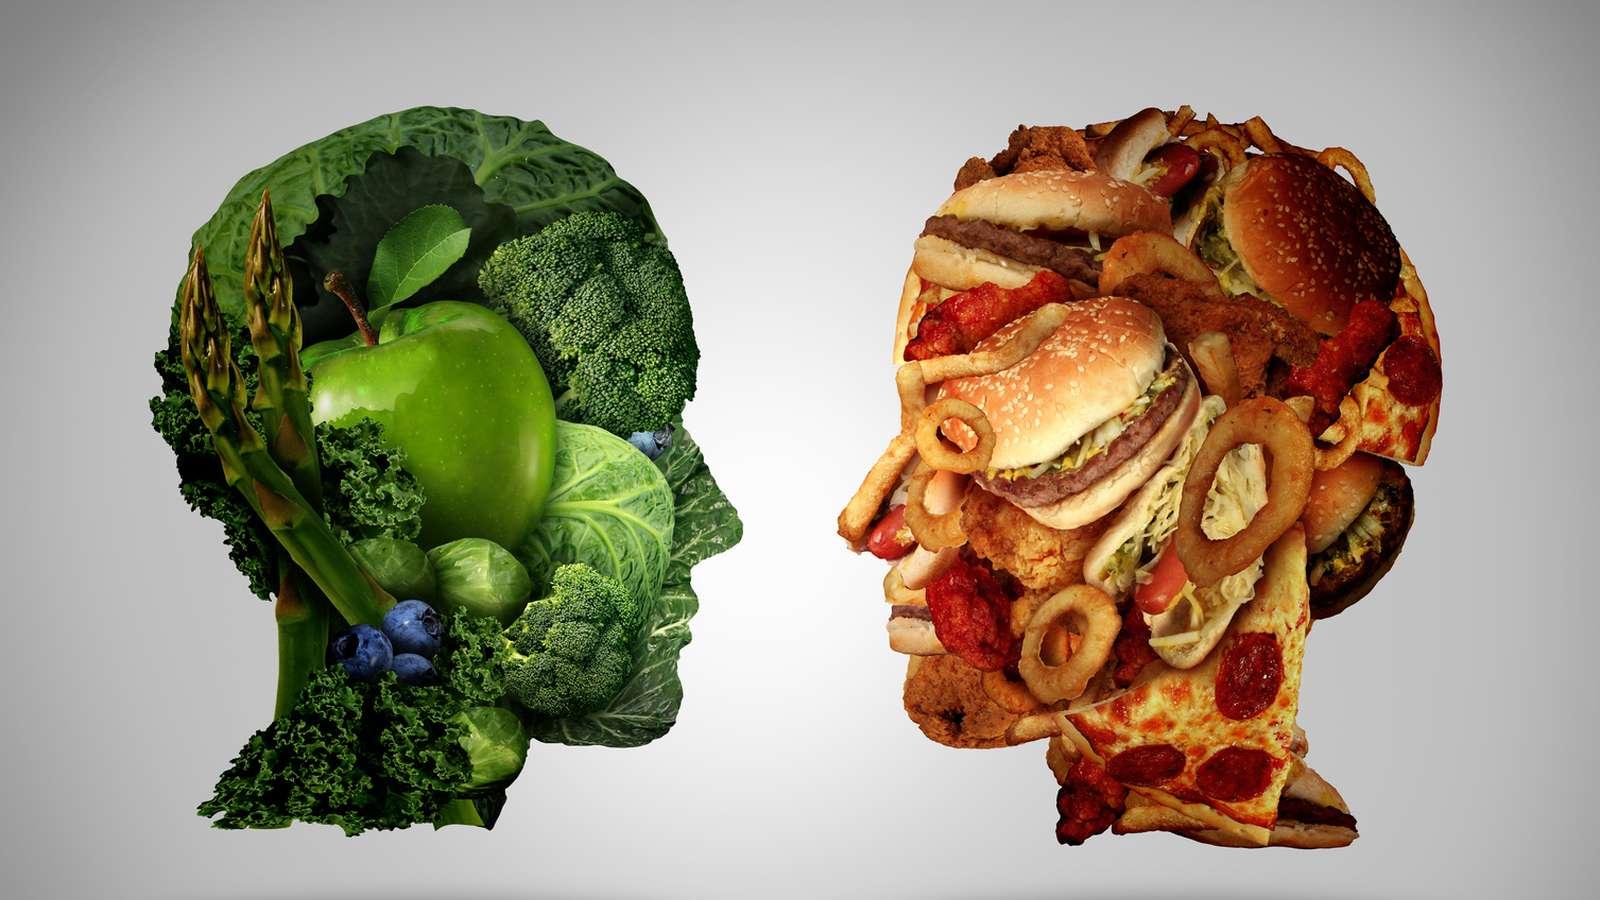 Healthy Food And Junk Food Wikipedia